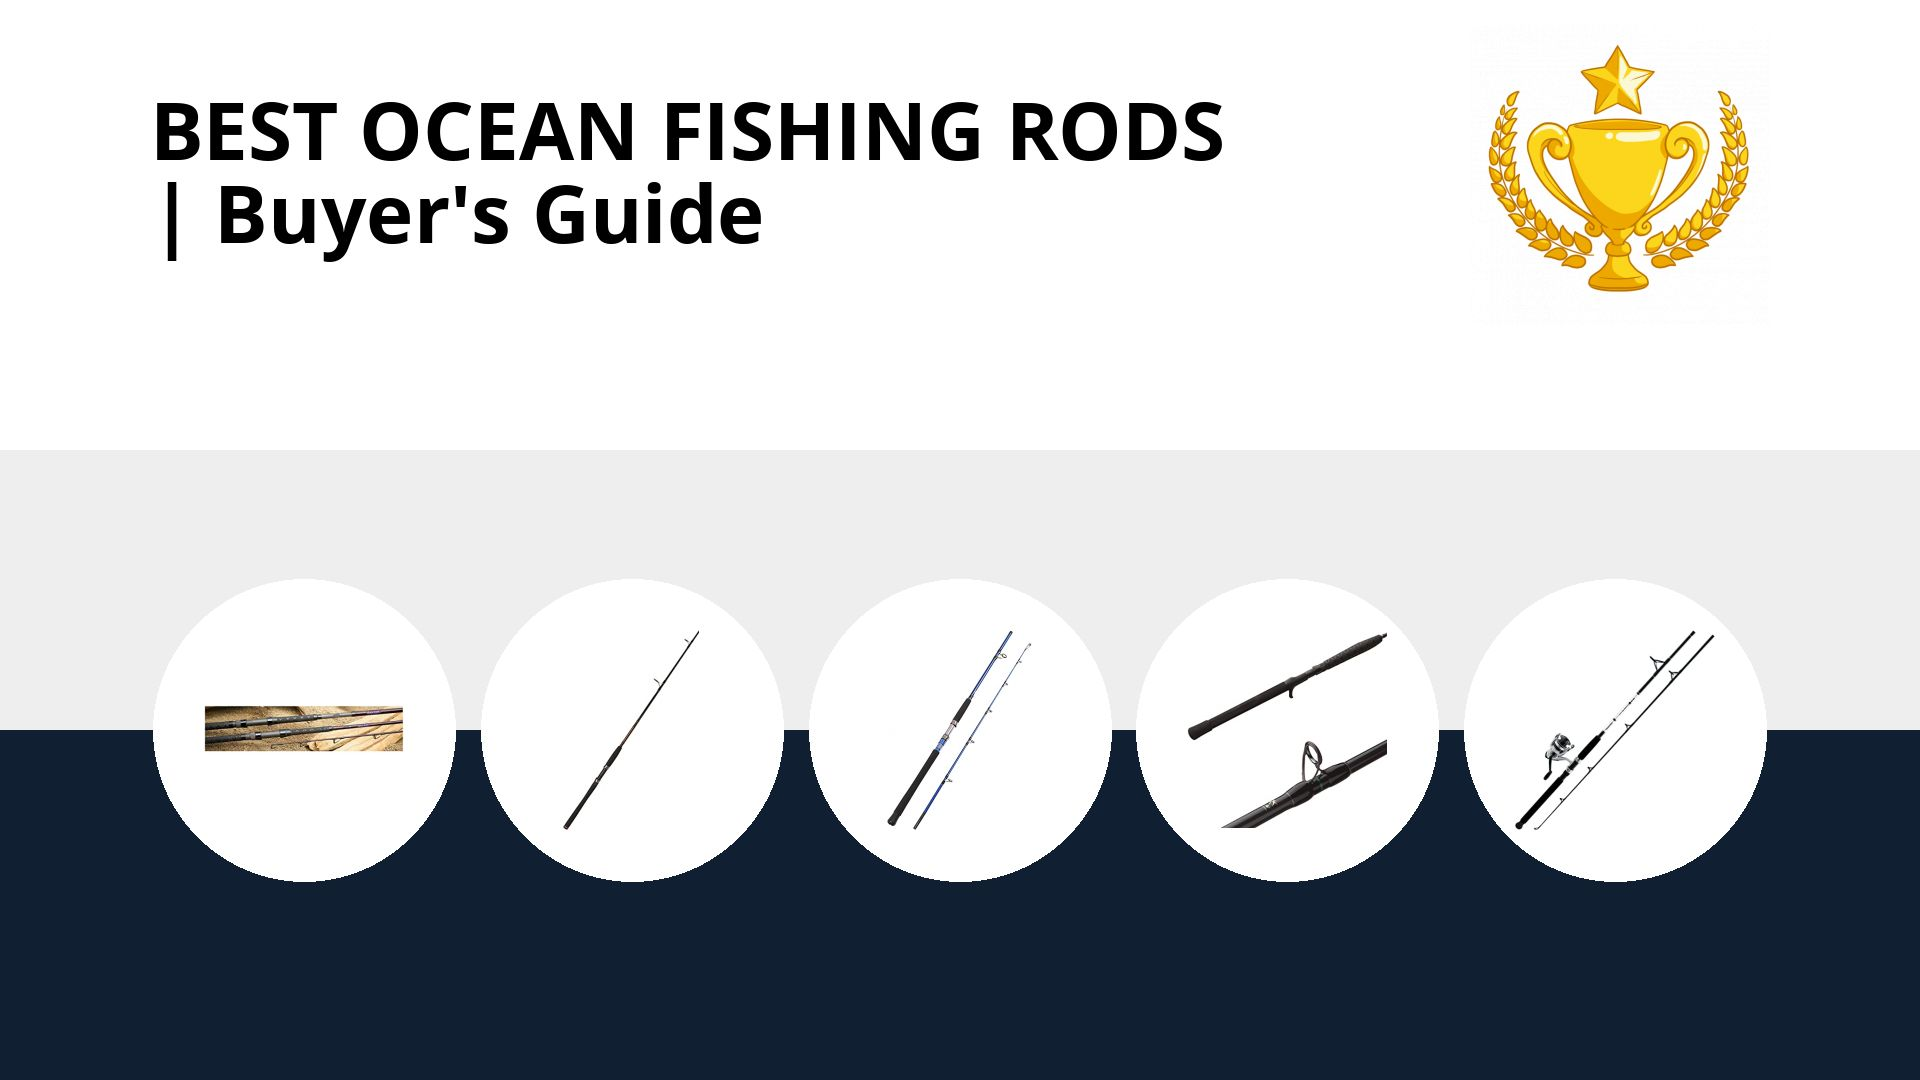 Best Ocean Fishing Rods: image